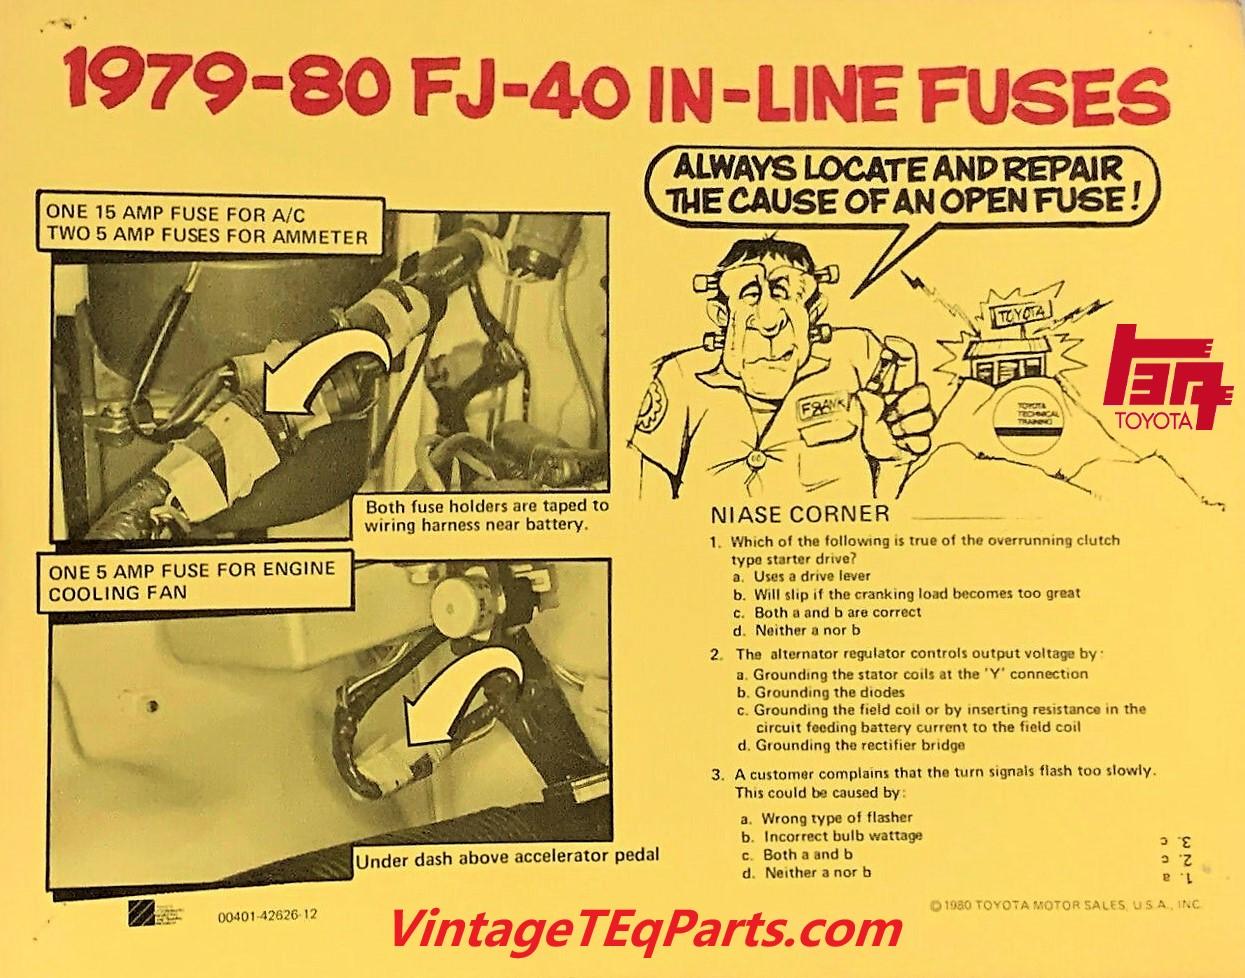 inline Fuse Poster - Copy - Copy.jpg